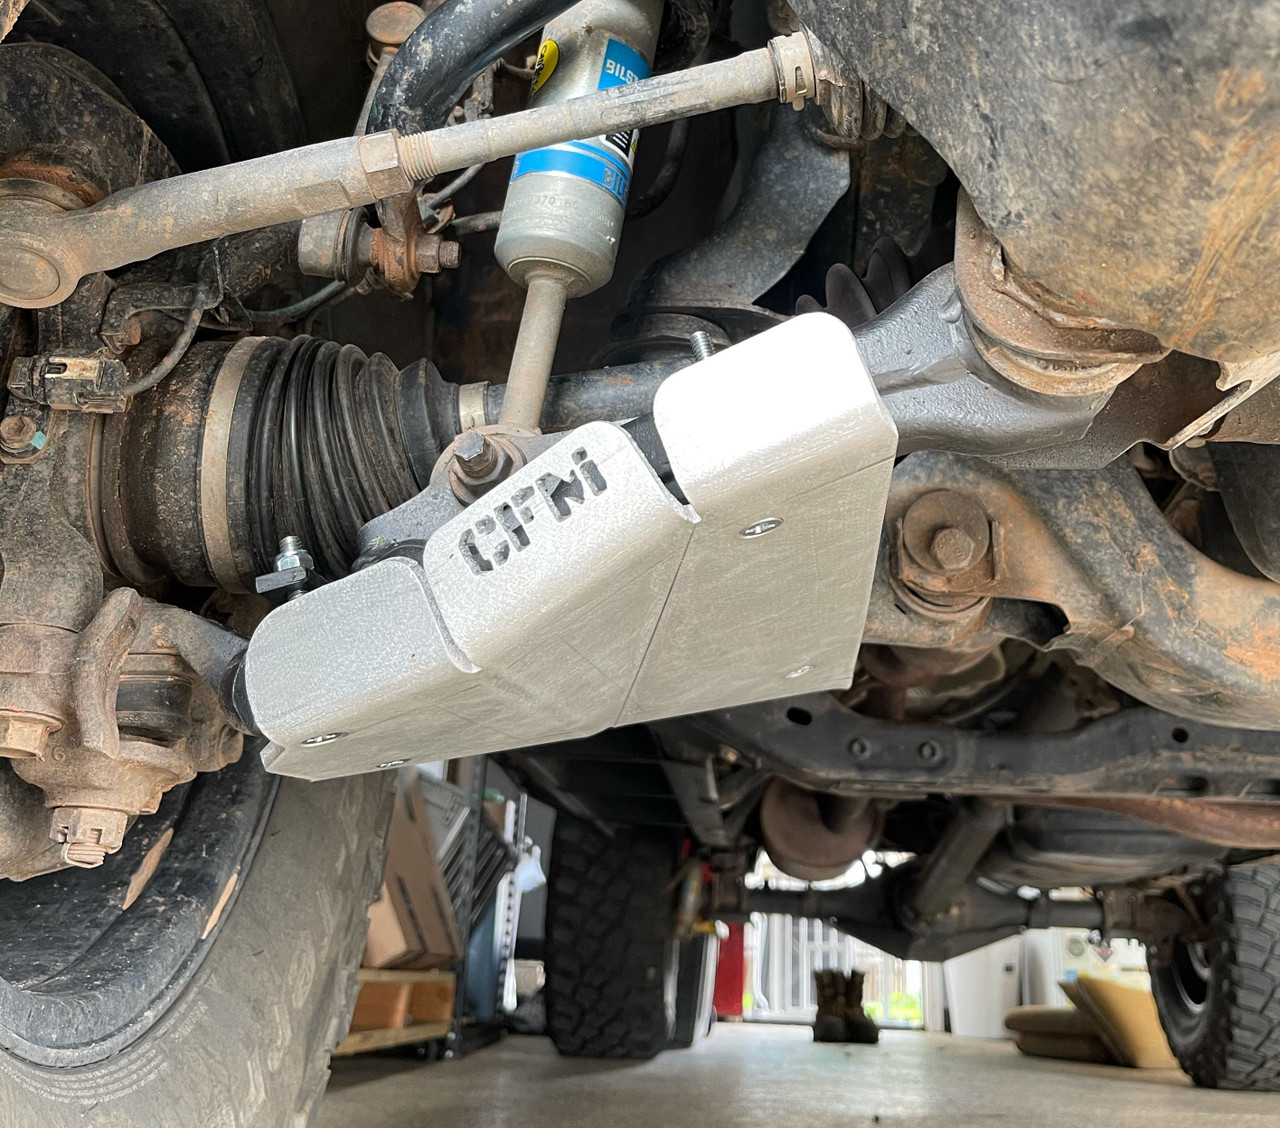 CFMi Toyota Tacoma 2nd Gen LCA Skids